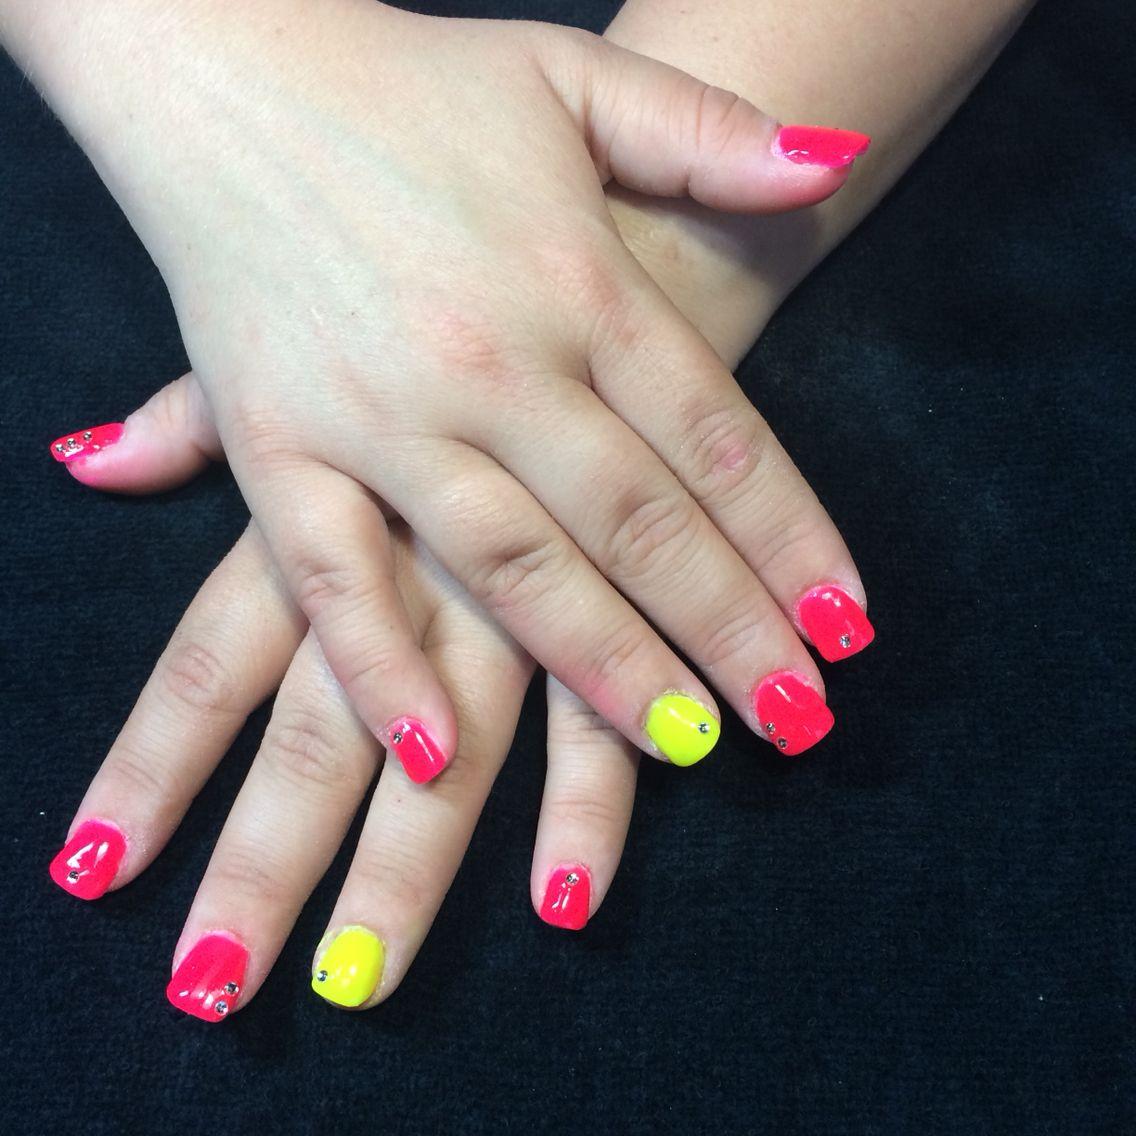 Ongle rose fluo et jaune nails ongles fait par moi pinterest roses - Ongle rose fluo ...